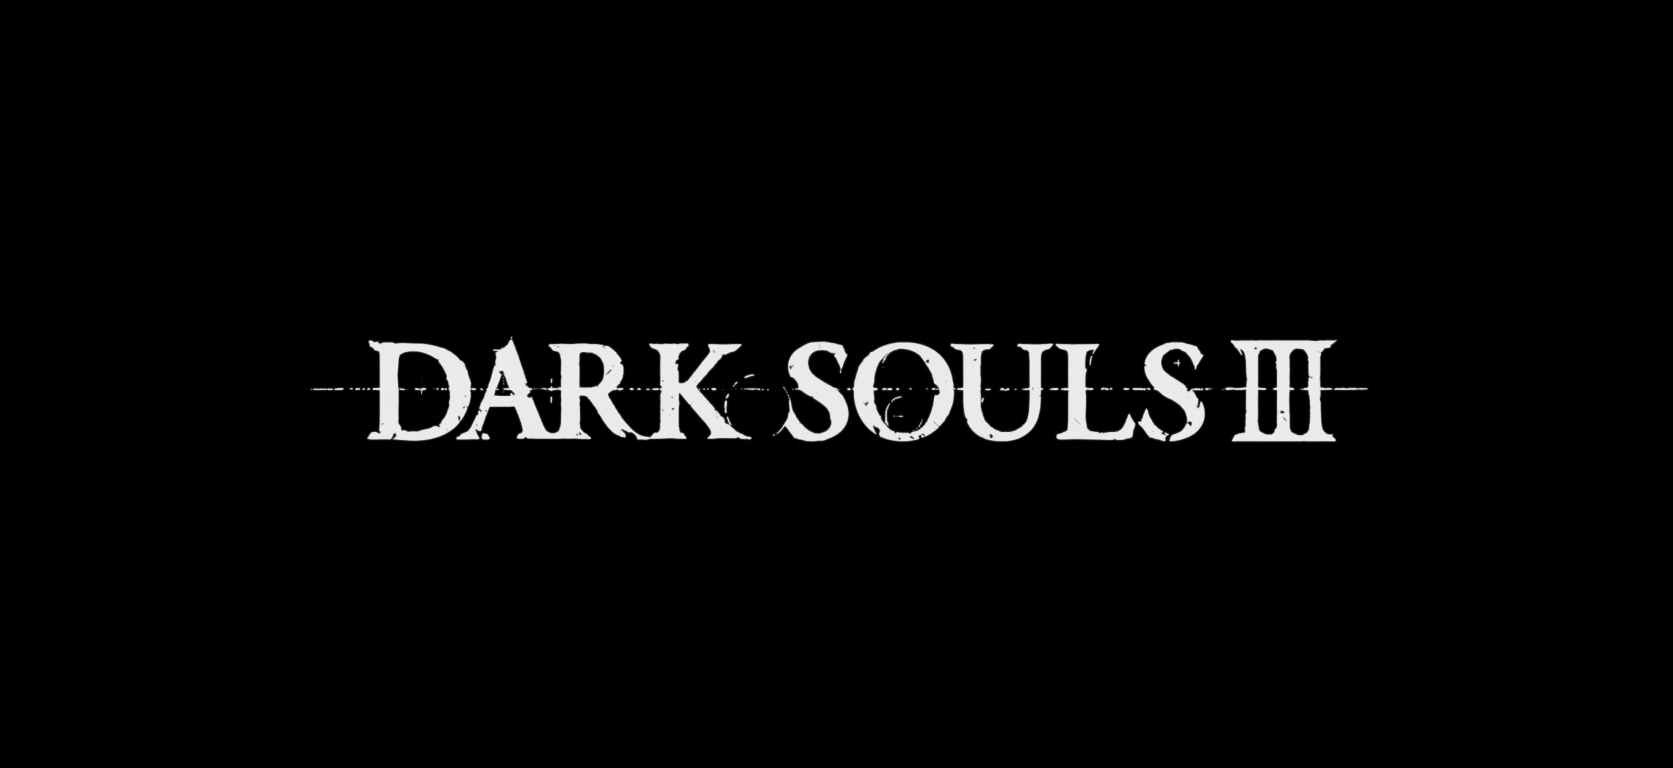 DarkSould3-01-culturageek.com.ar